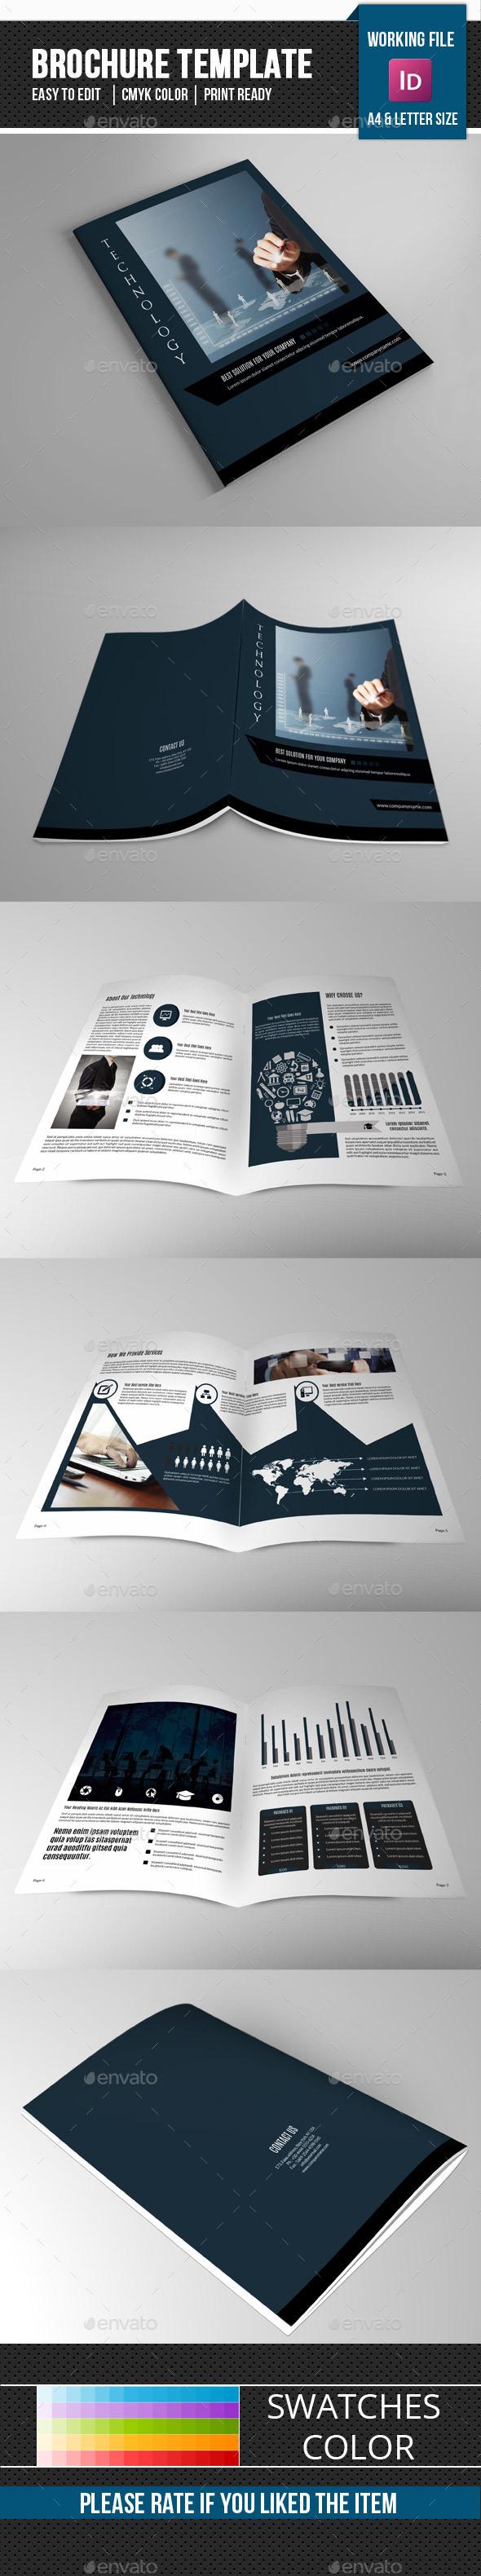 Technology Brochure Template-V323 - Corporate Brochures